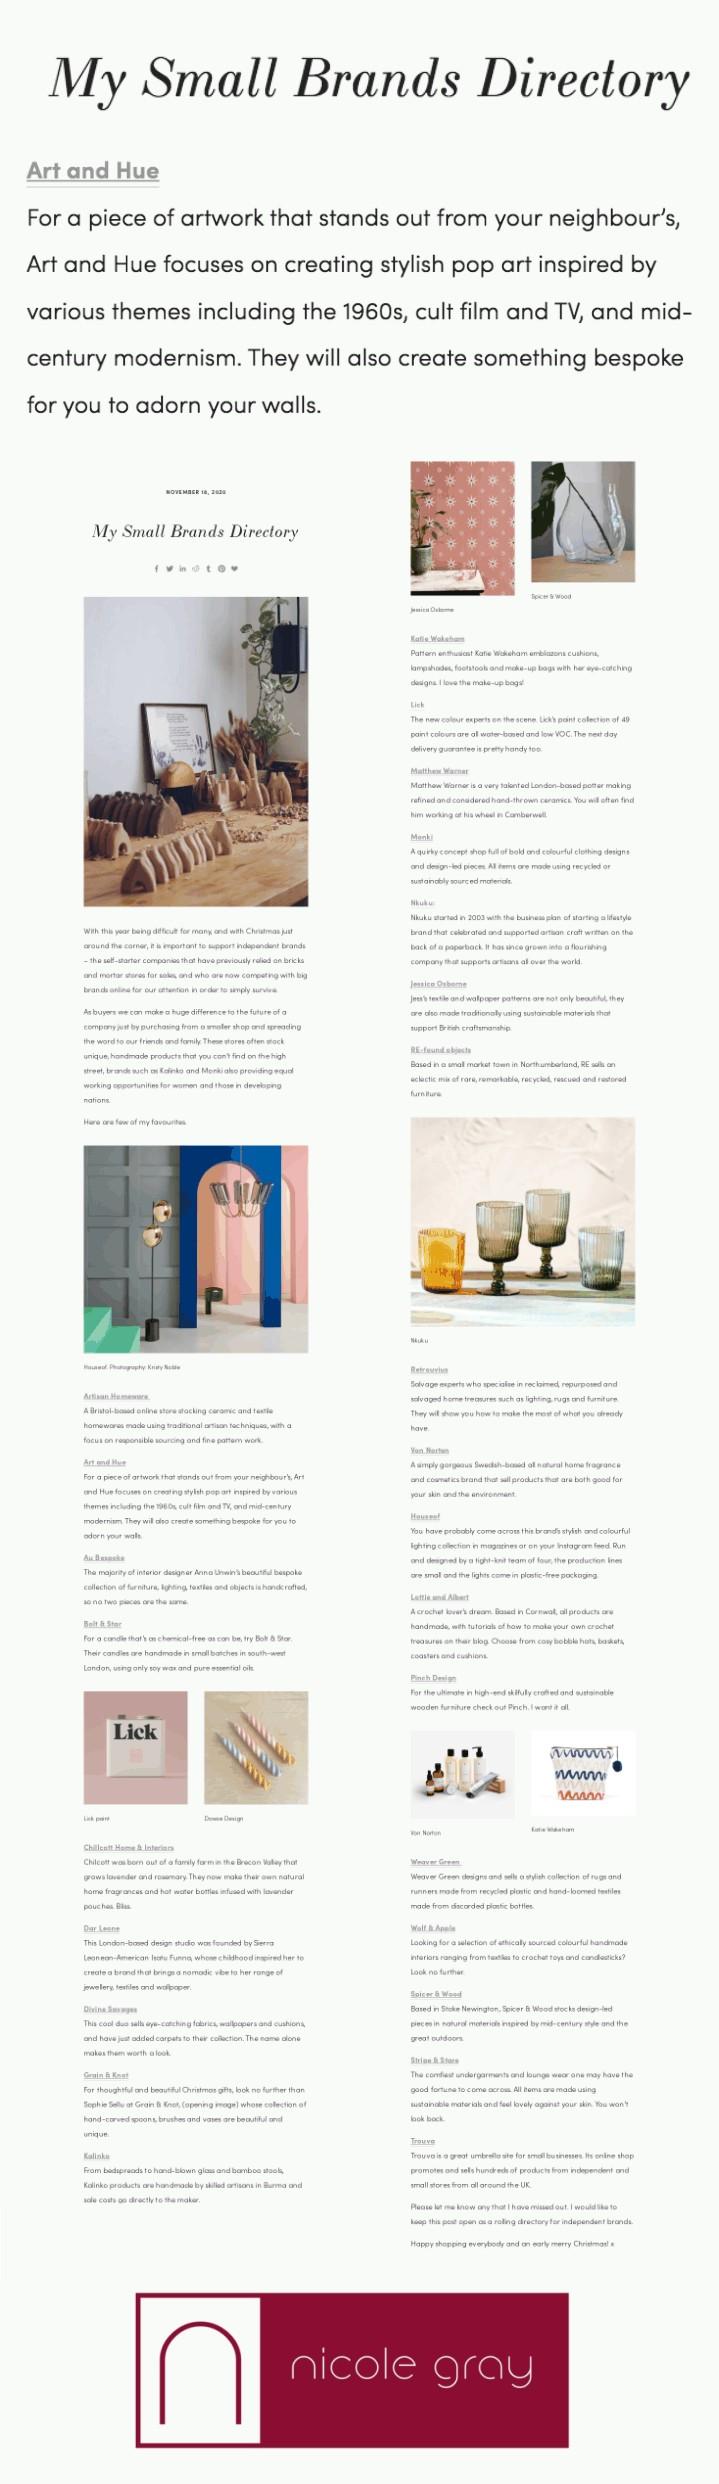 Nicole Gray Stylist Small Brands Directory